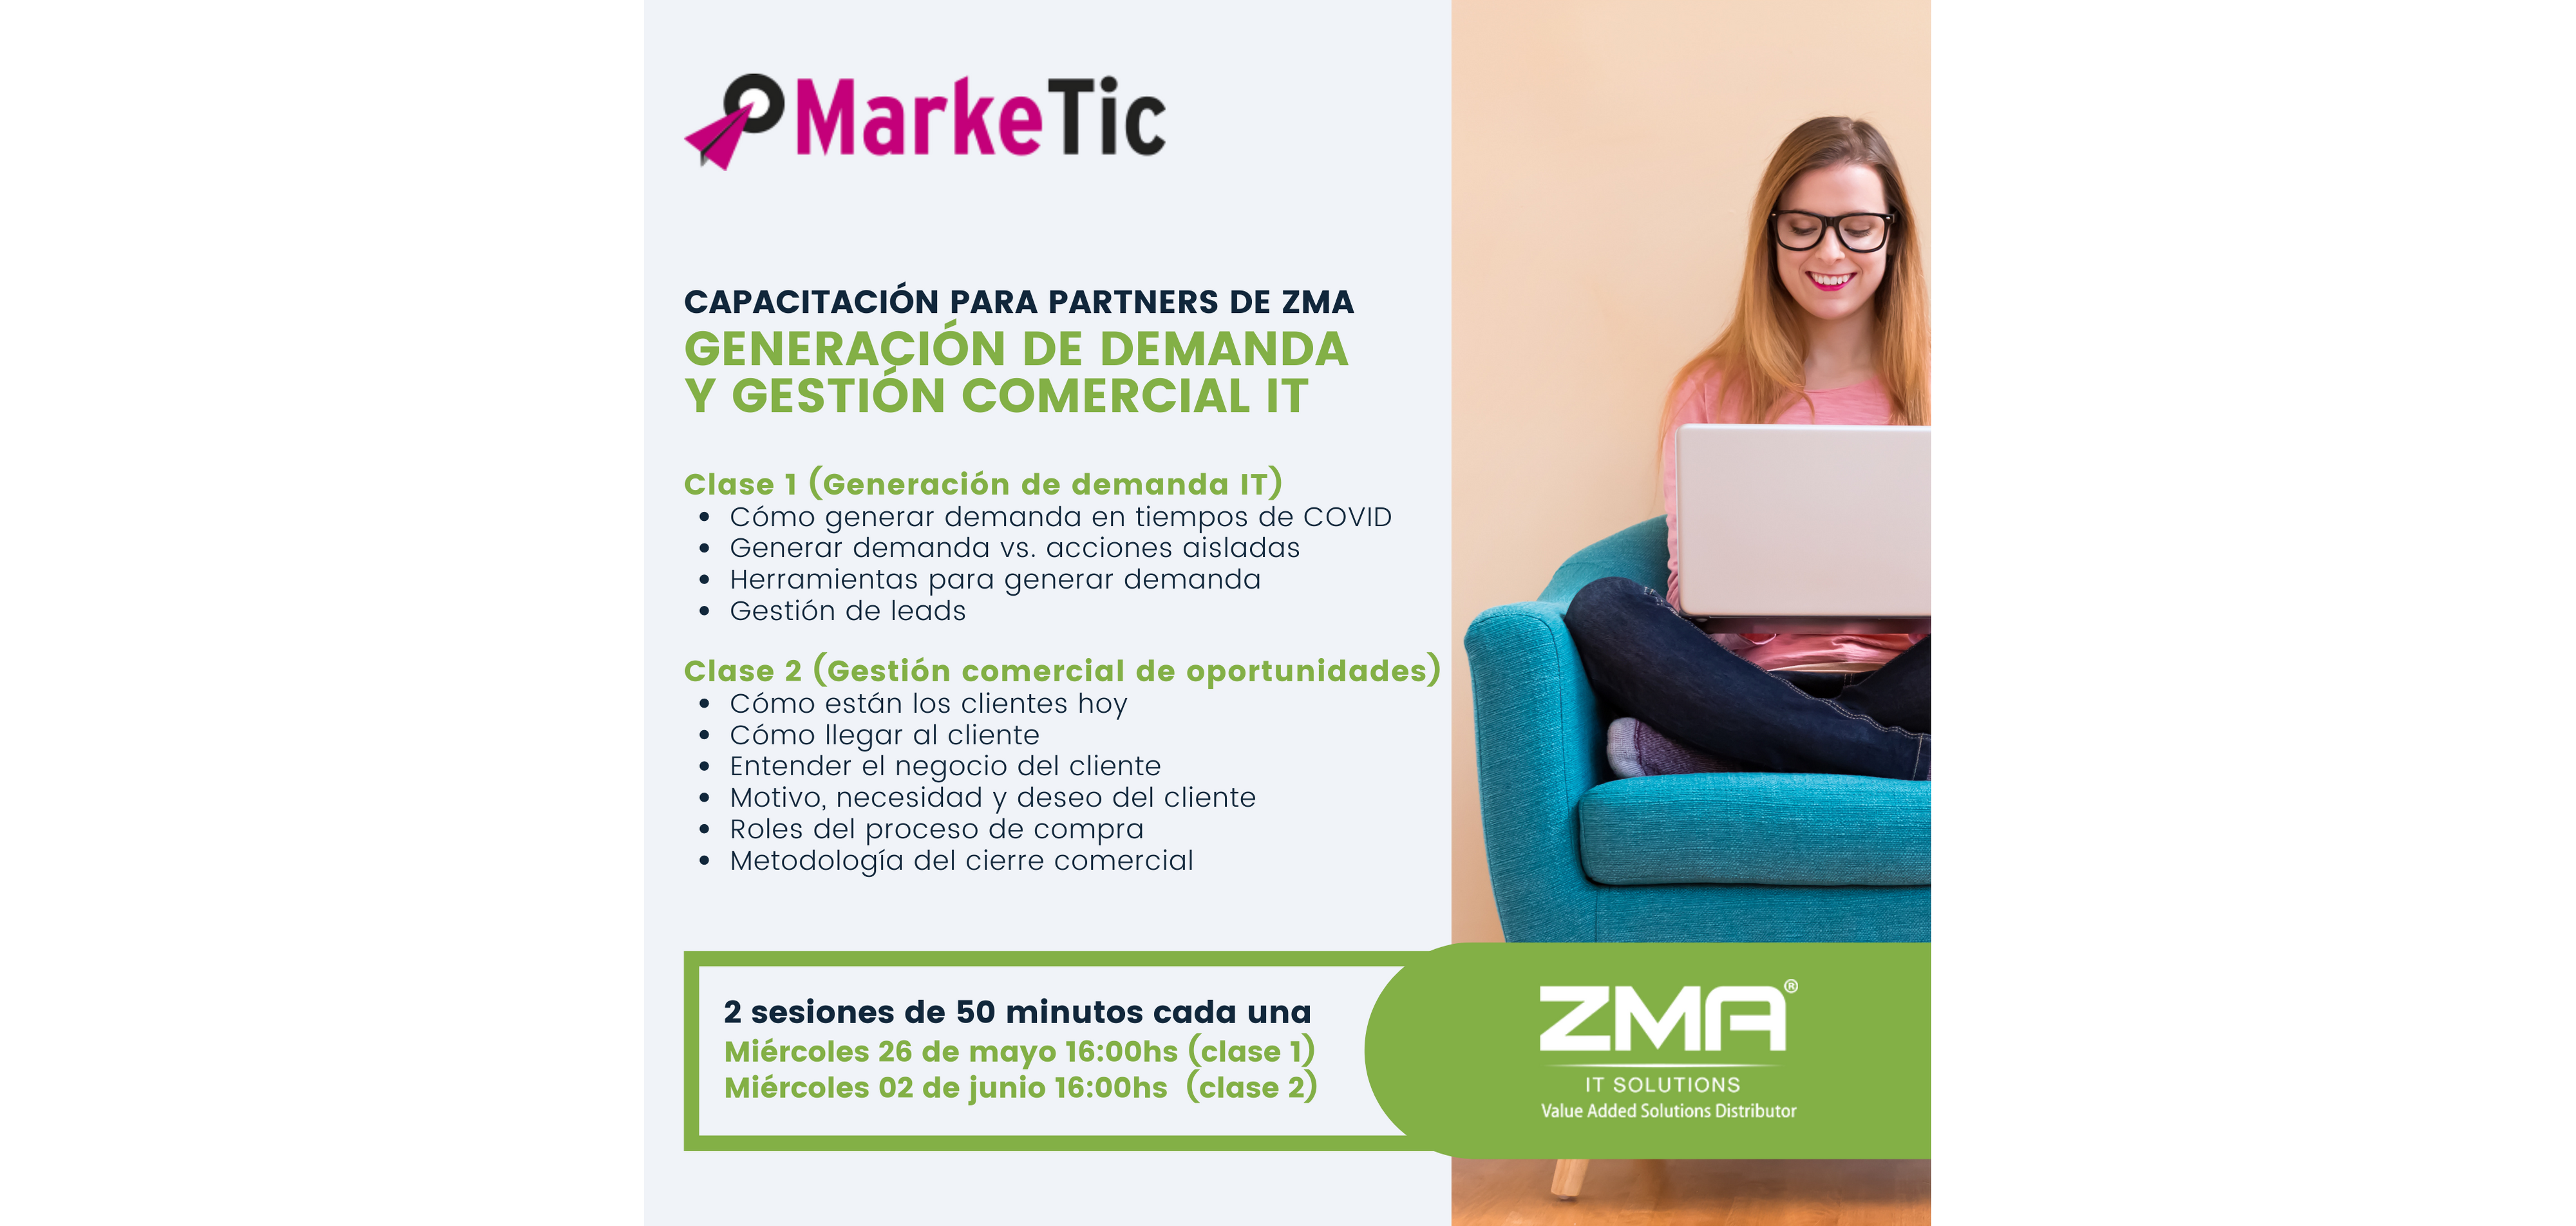 Marketic capacitacion ZMA